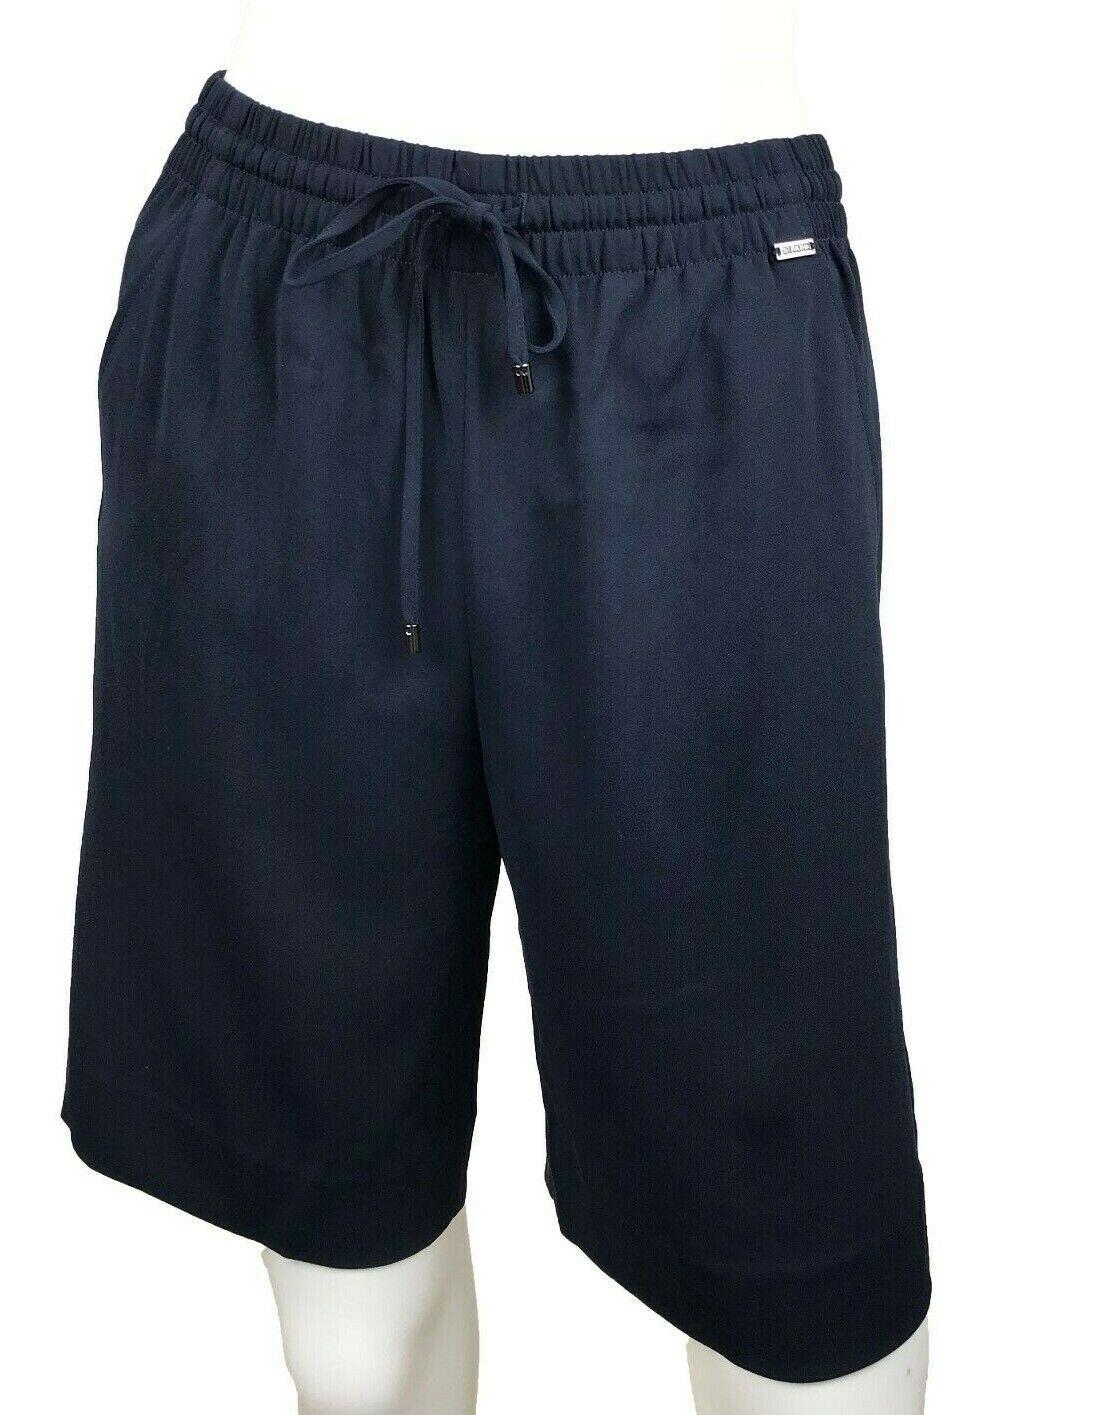 New w Tags  St. John Shorts. Navy bluee. Size Petite. Drawstring.